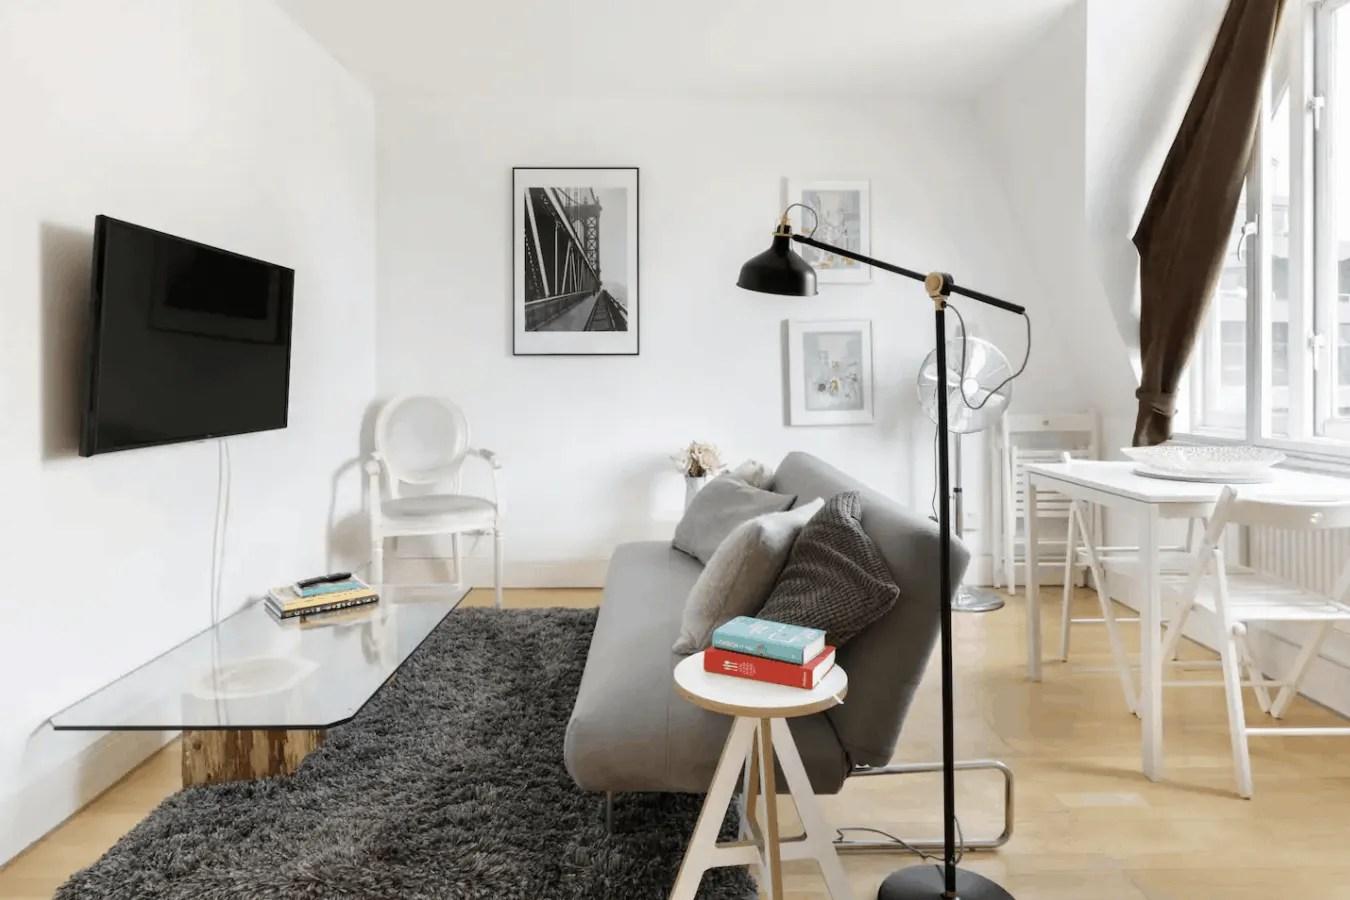 Budget London Airbnbs - Farringdon Retreat